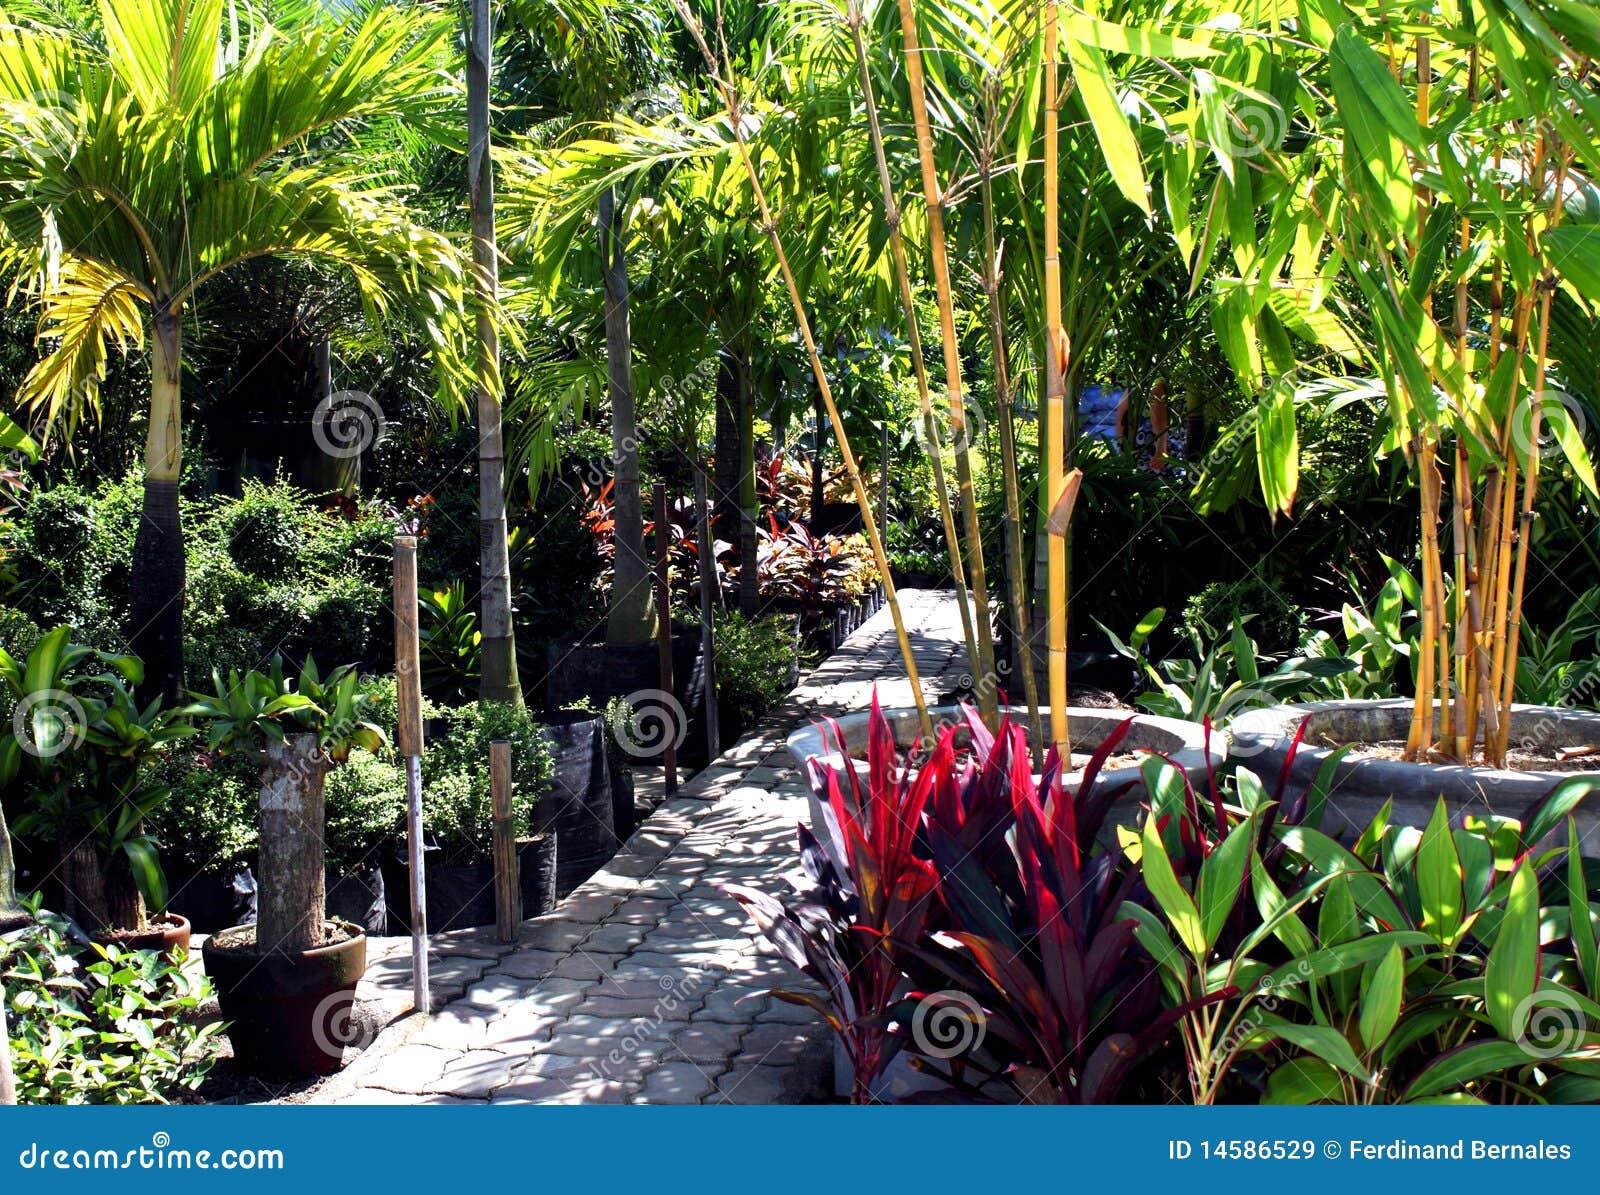 Botanical Garden Royalty Free Stock Images Image 14586529